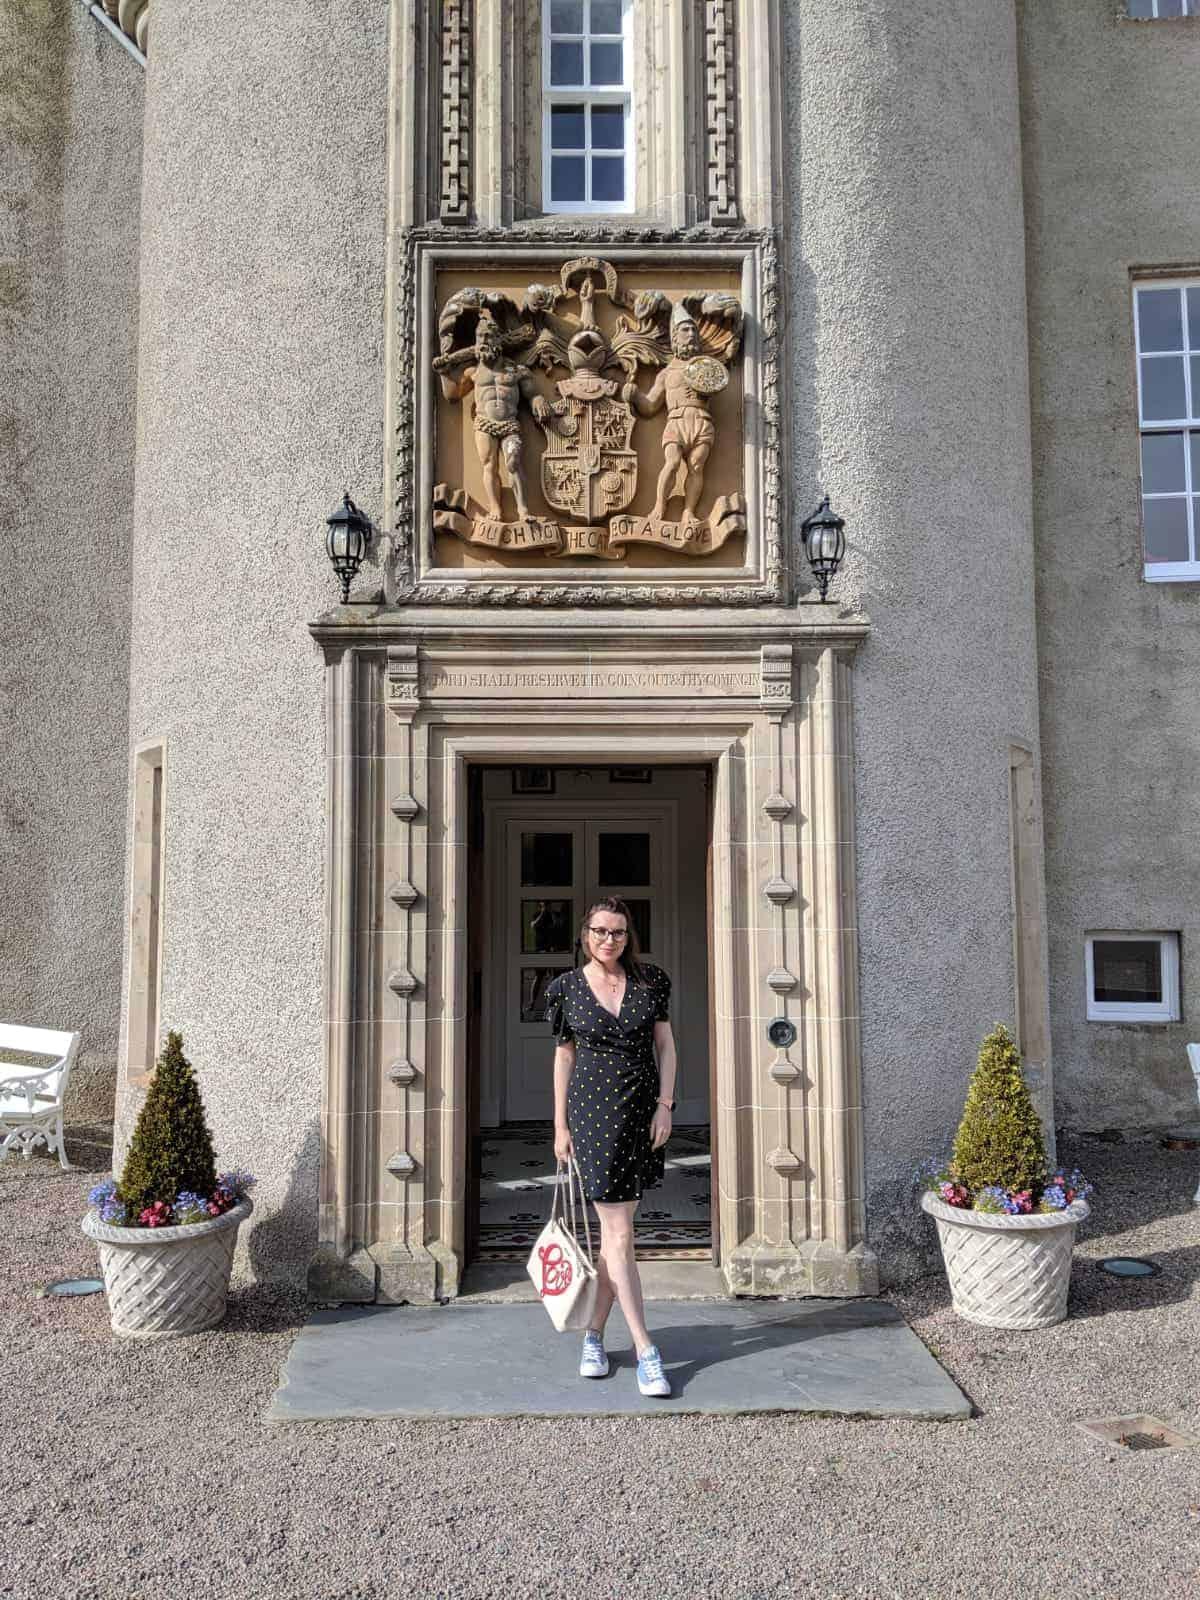 Visiting Ballindalloch Castle, A visit to Ballindalloch Castle